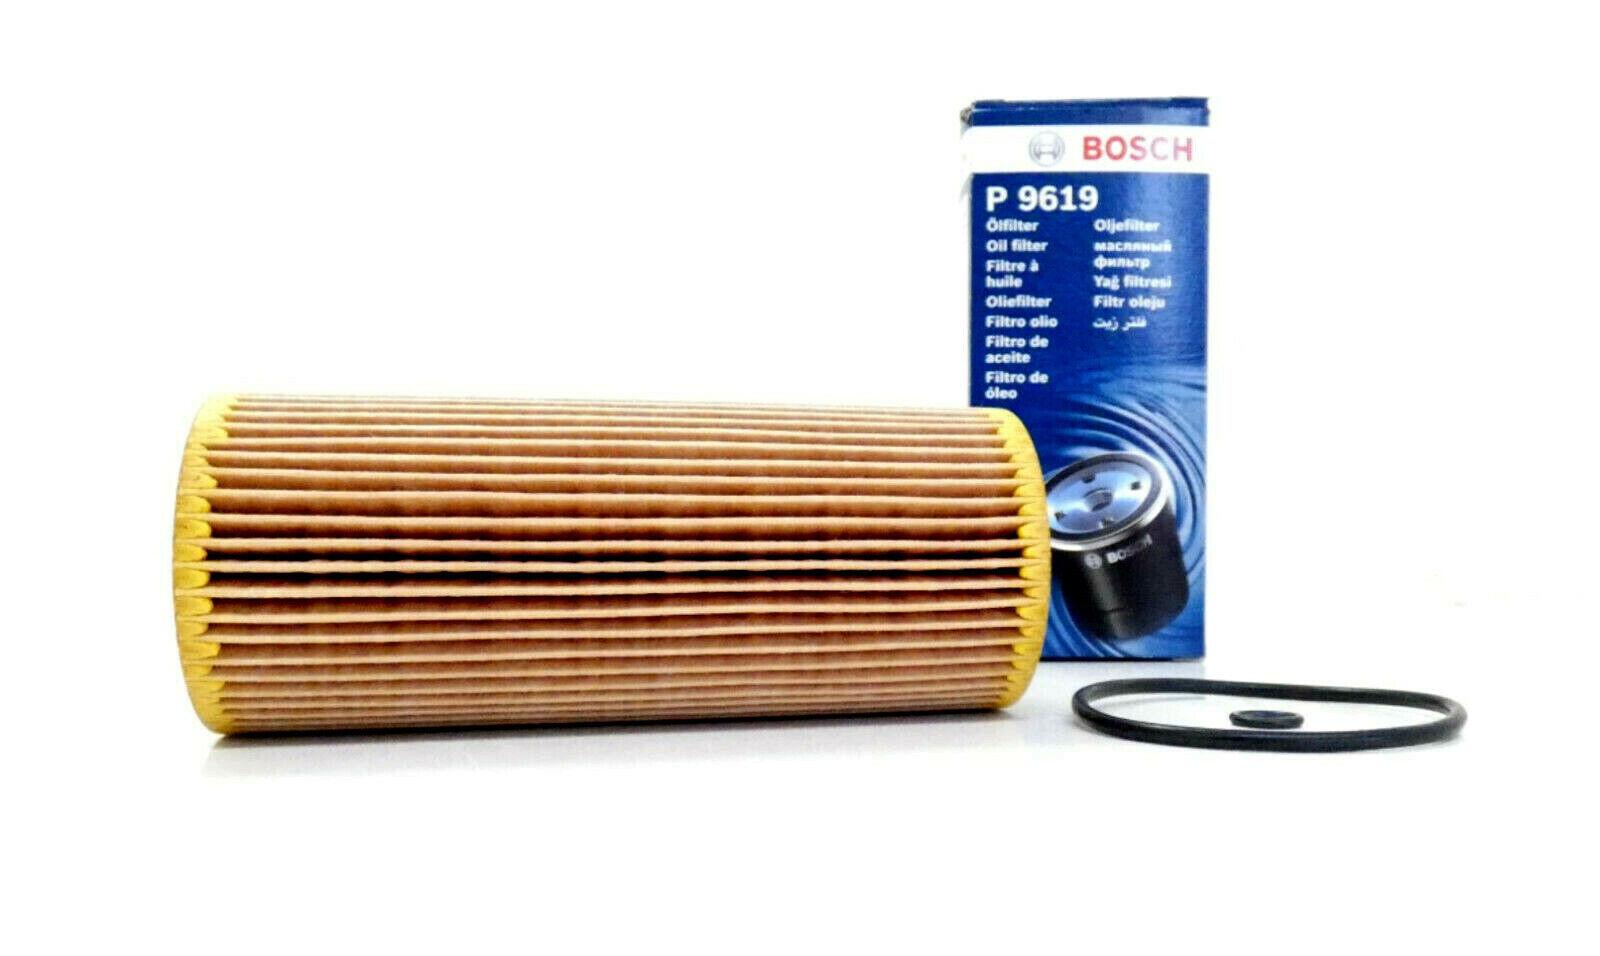 Bosch filtro aceite filtro aceite de motor Audi FORD SEAT SKODA VW p9619 1457429619